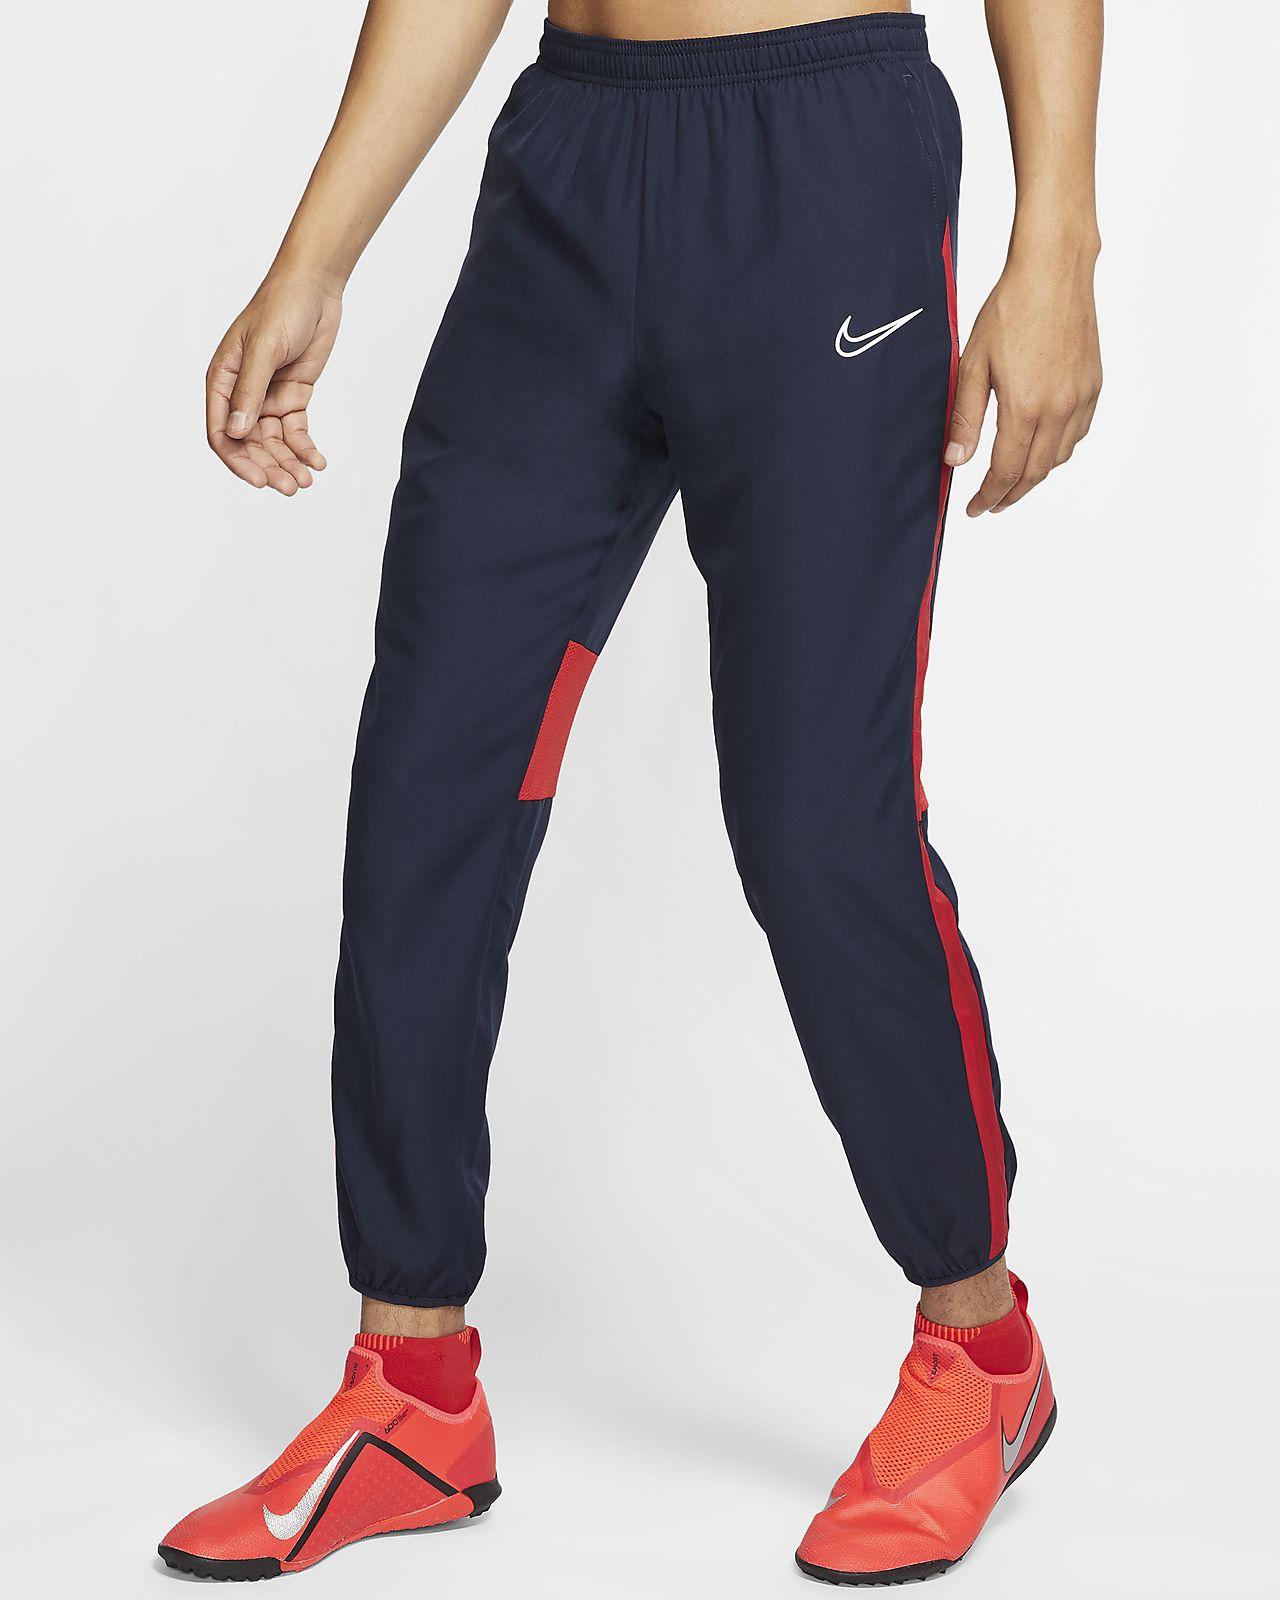 Nike Dri-FIT Academy Men's Adjustable Soccer Pants